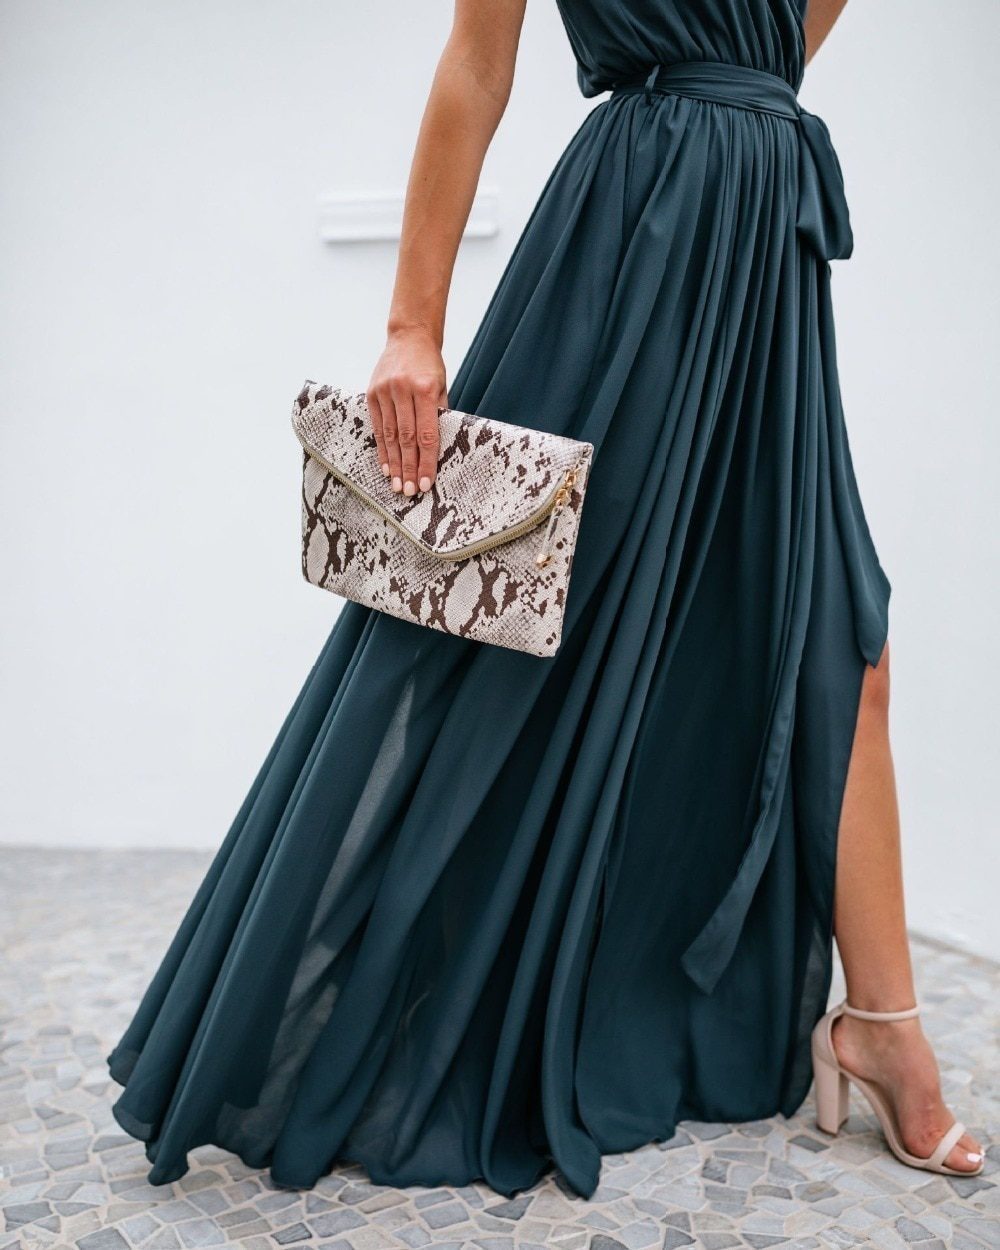 Sexy women Strap Maxi Dress V Neck Backless Chiffon Bandage beach Party Dress elegant Summer boho long dress vestidos 2021 new